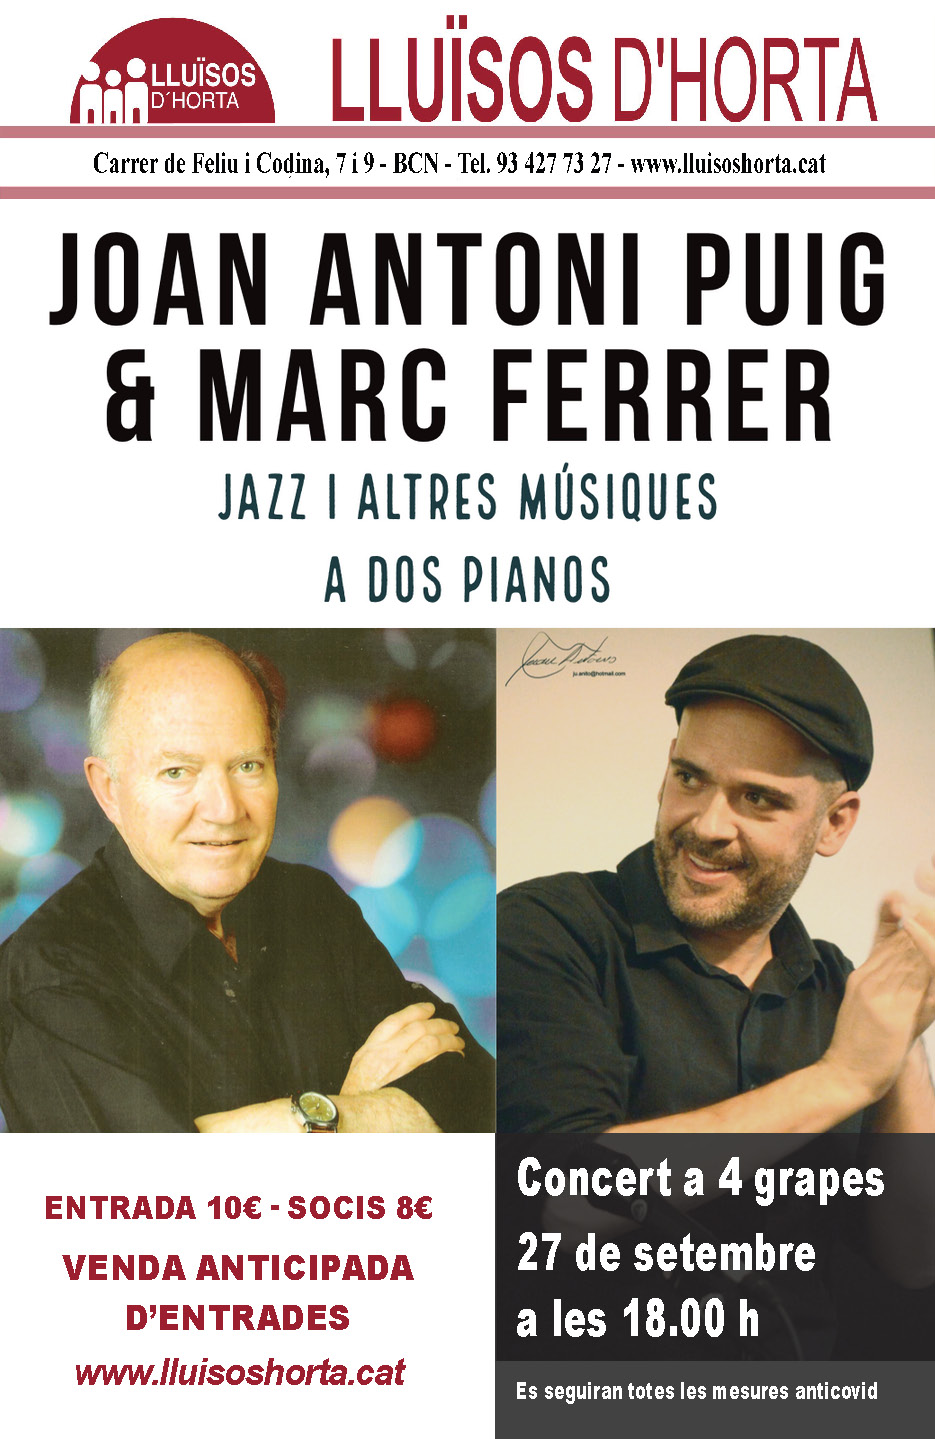 Joan Antoni Puig & Marc Ferrer